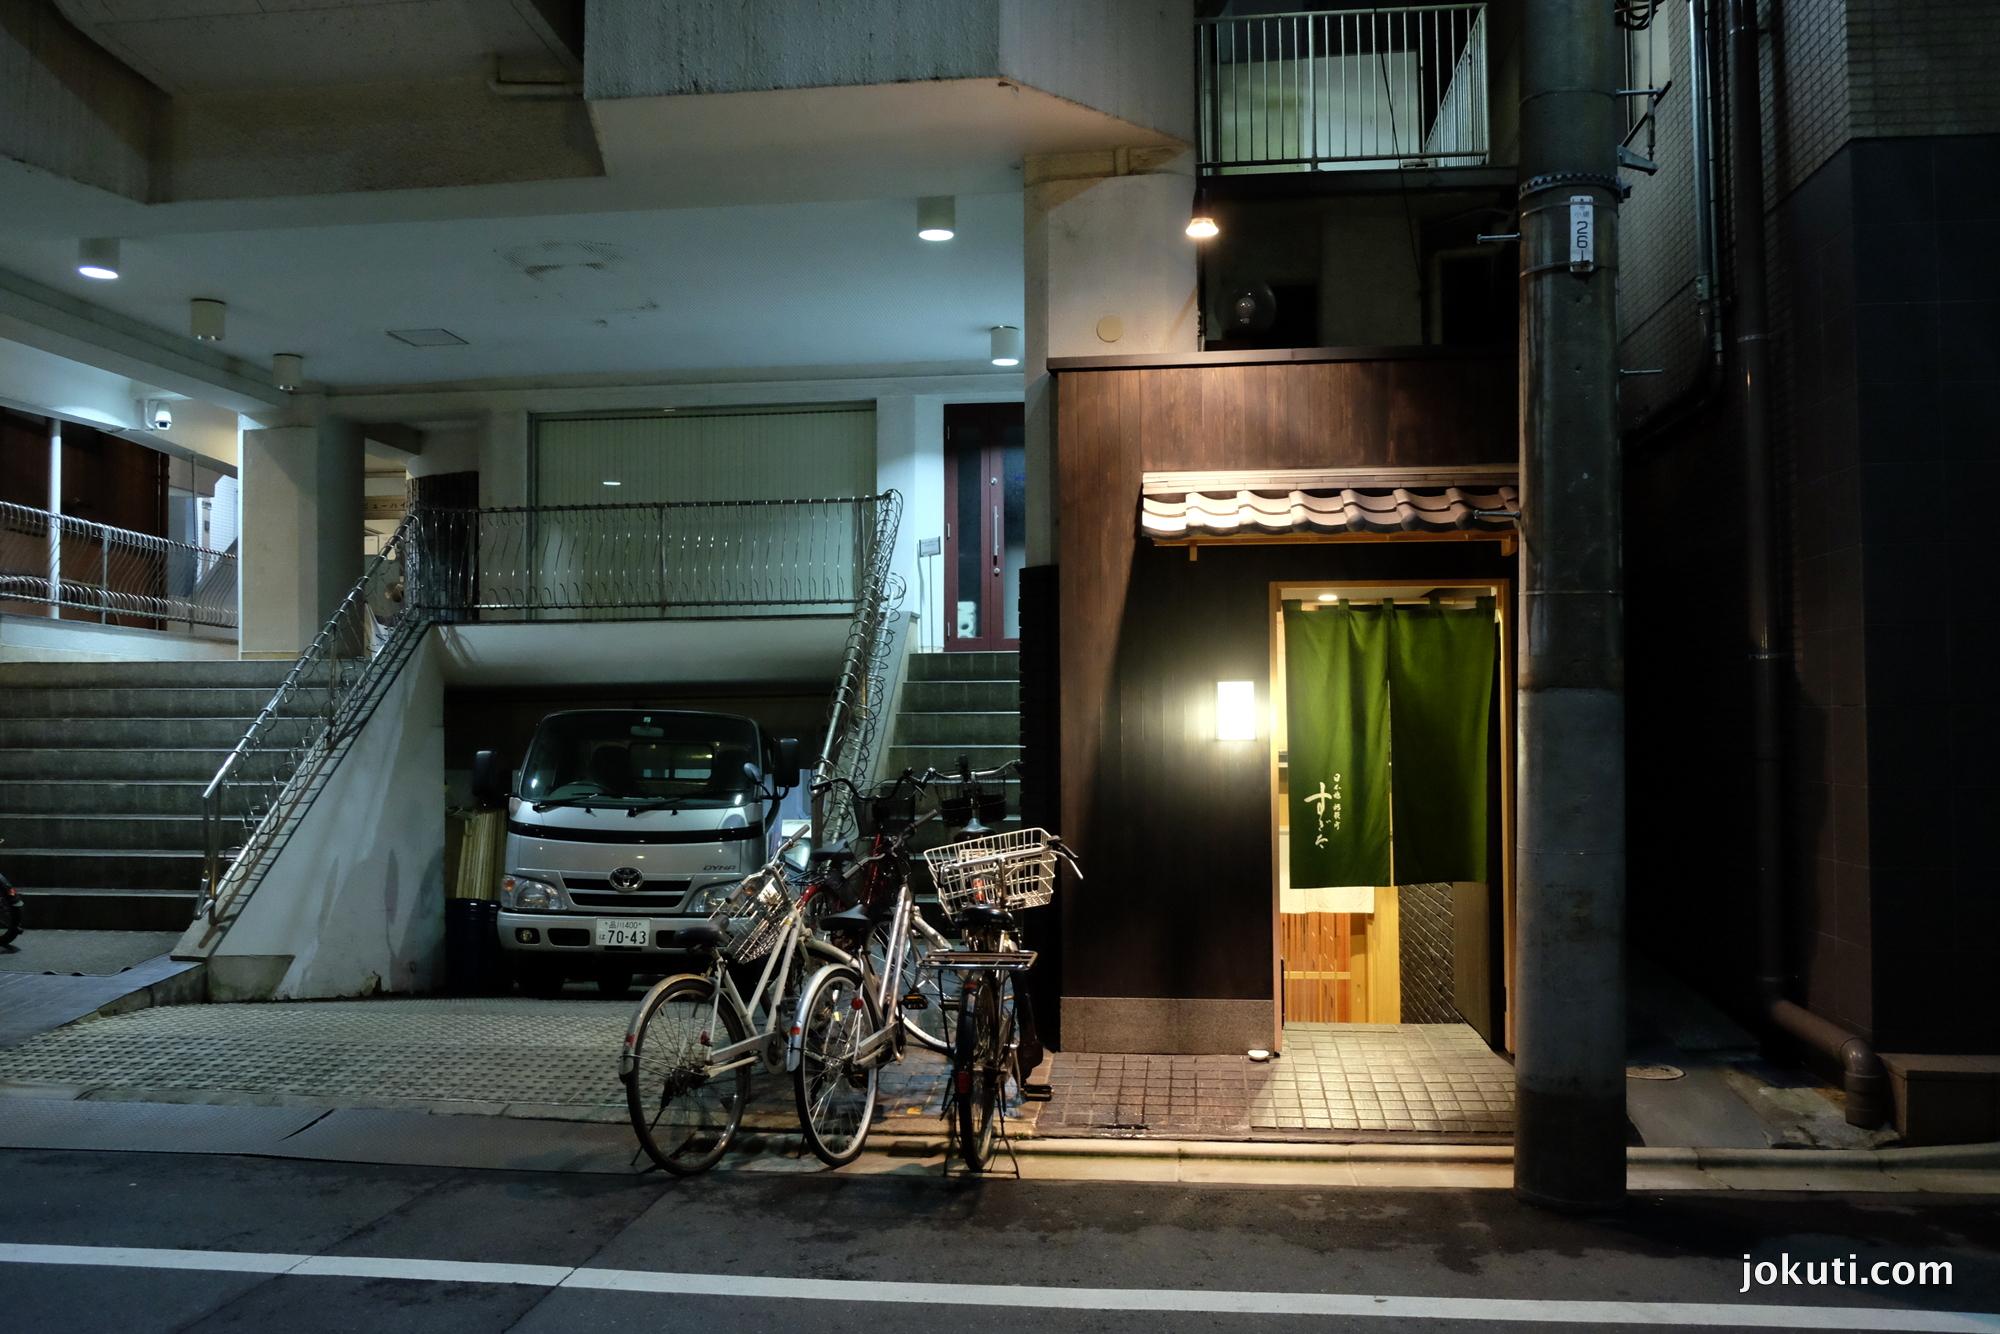 dscf5454_sugita_sushi_michelin_tokyo_japan_vilagevo_jokuti.jpg